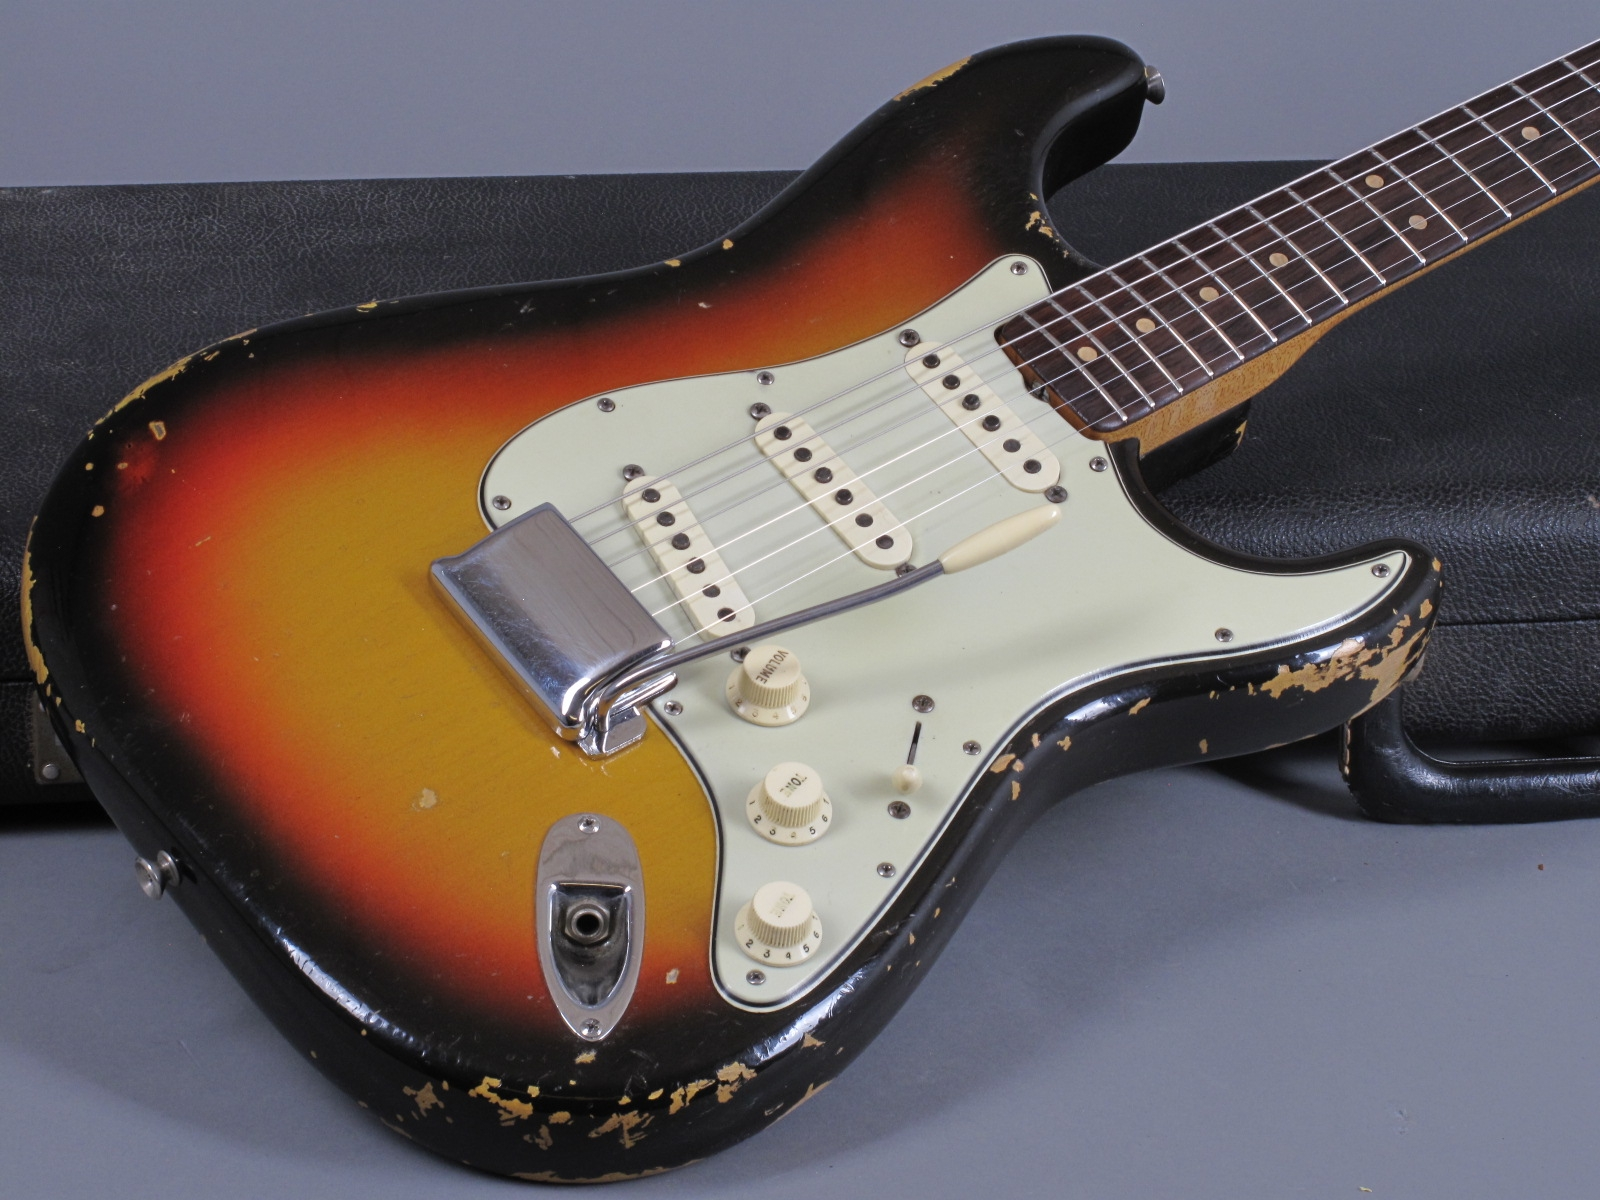 https://guitarpoint.de/app/uploads/products/1964-fender-stratocaster-3-tone-sunburst-5/1964-Fender-Strat-3tSB-_L63943_22.jpg